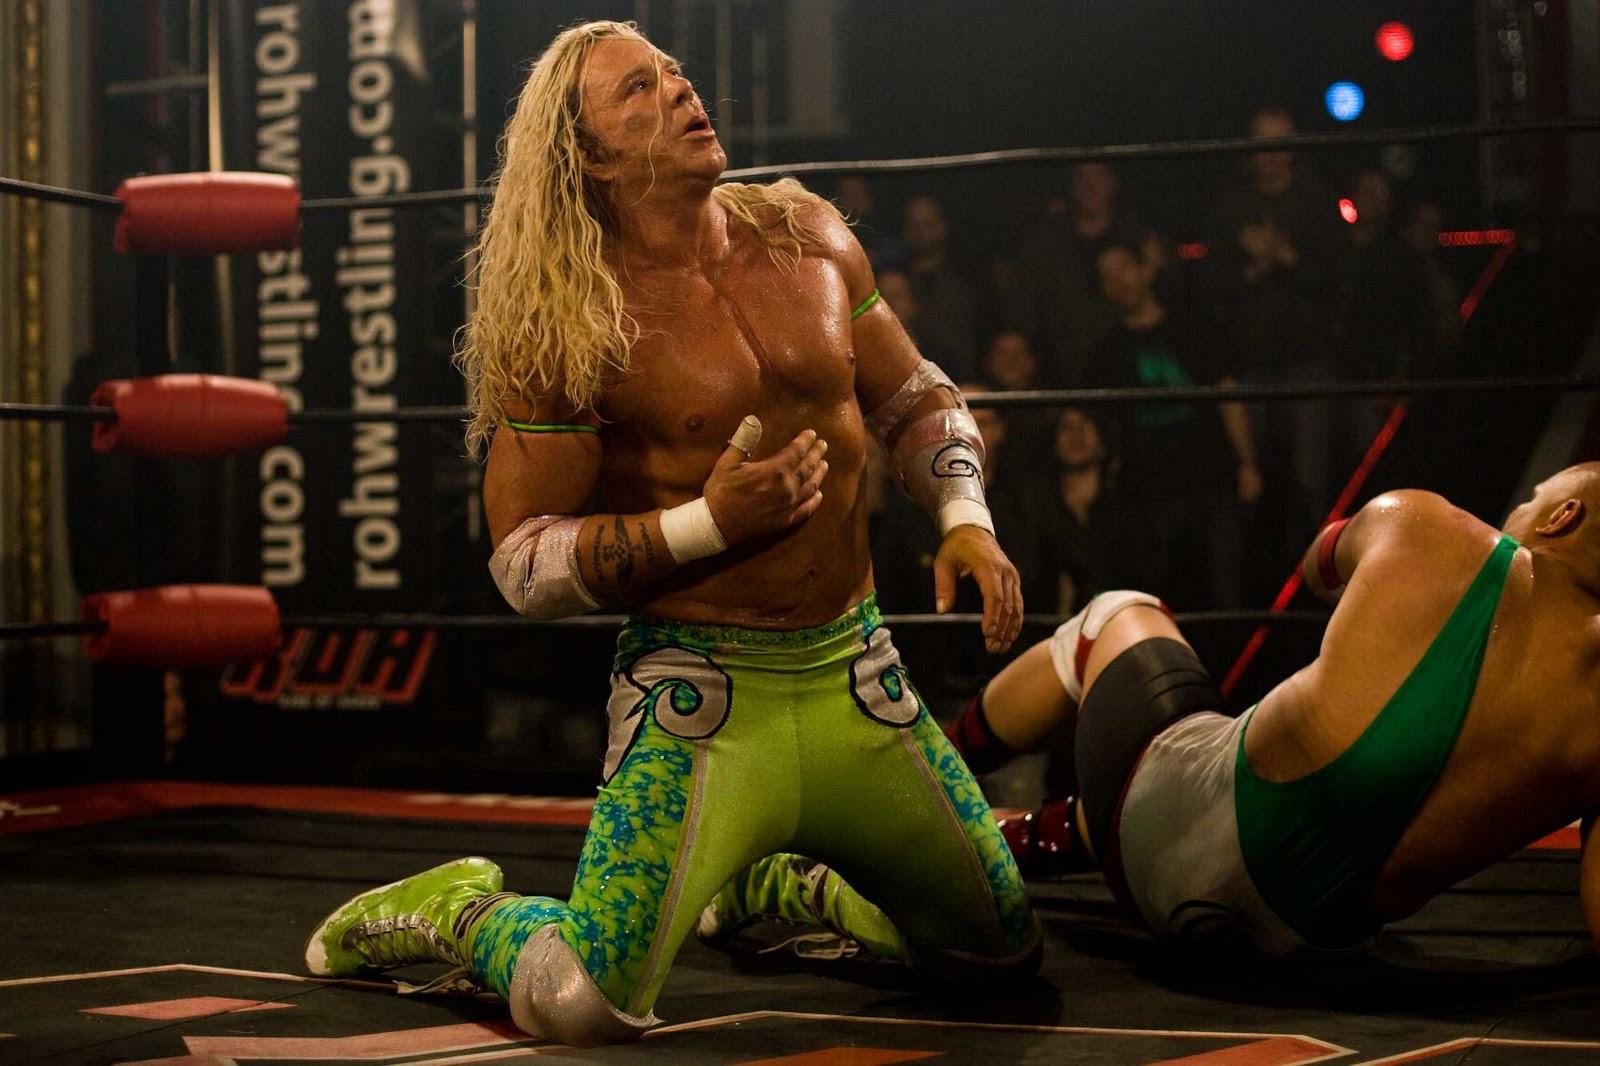 http://1.bp.blogspot.com/-wwphZuvMtHw/TnRBUAkGIPI/AAAAAAAABZg/c_vKPibacK4/s1600/the_wrestler_2008.jpg